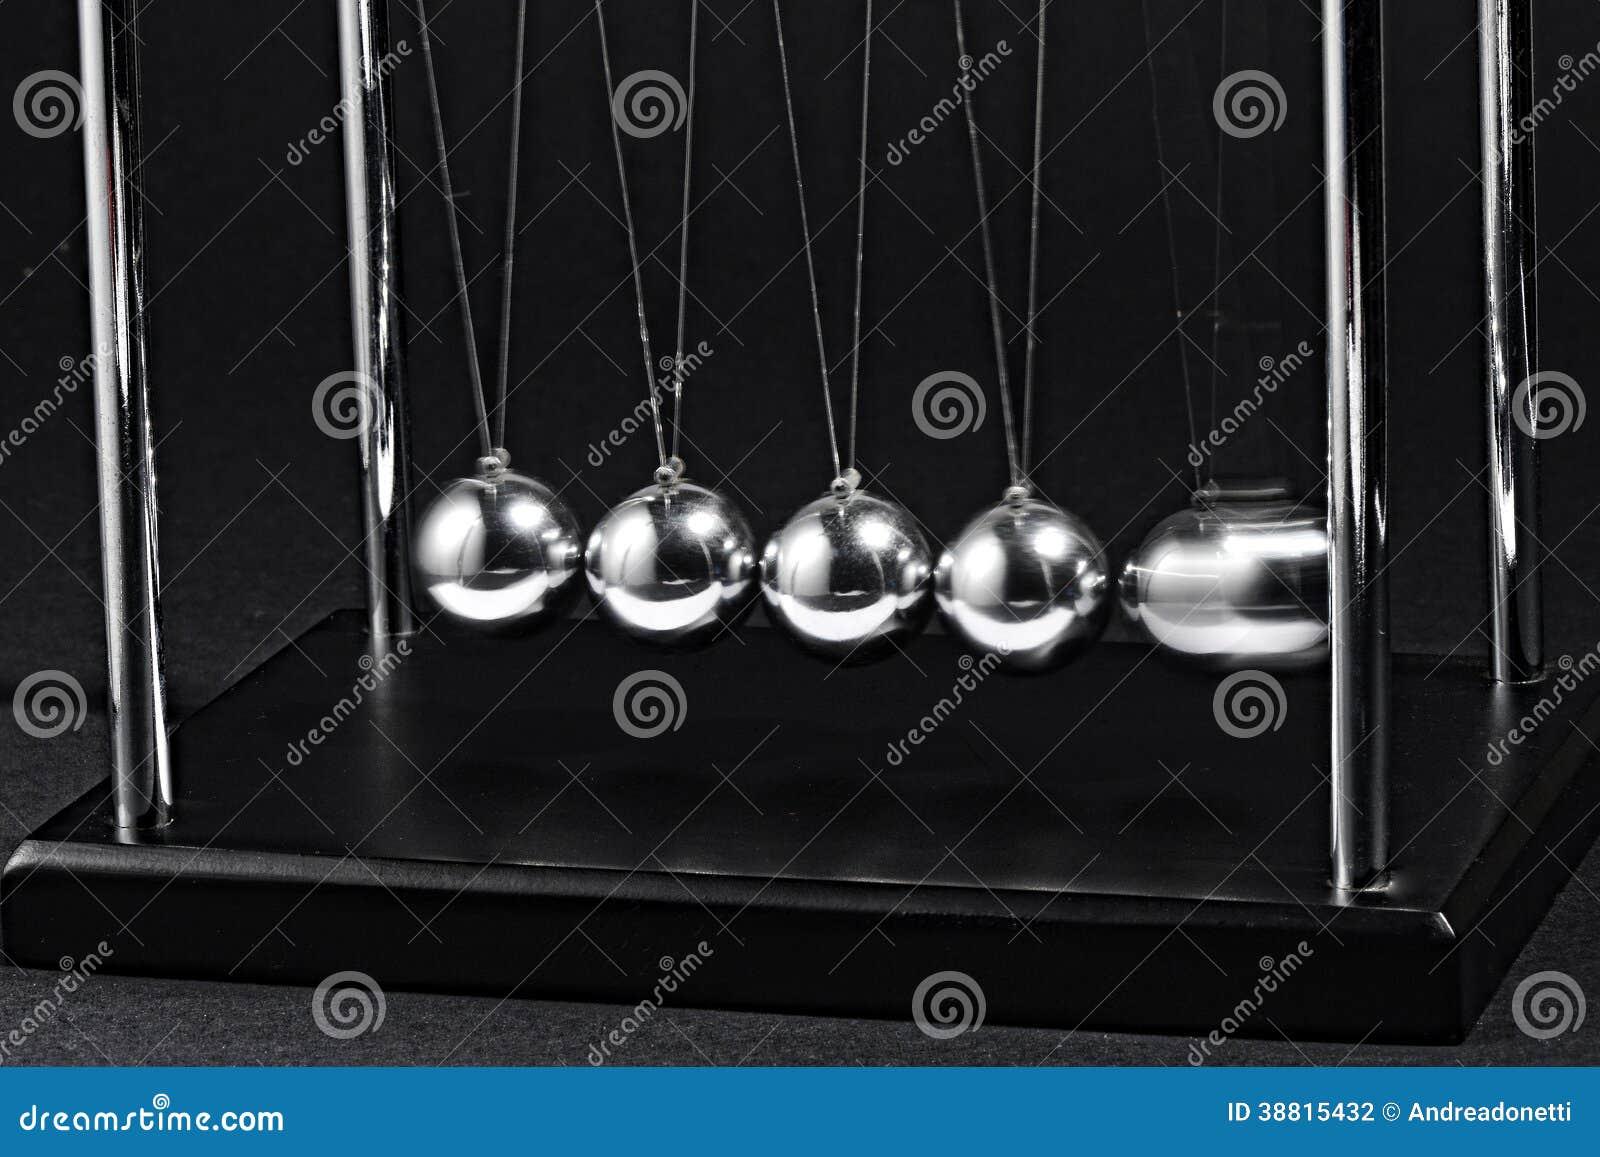 Question What Swinging momentum balls